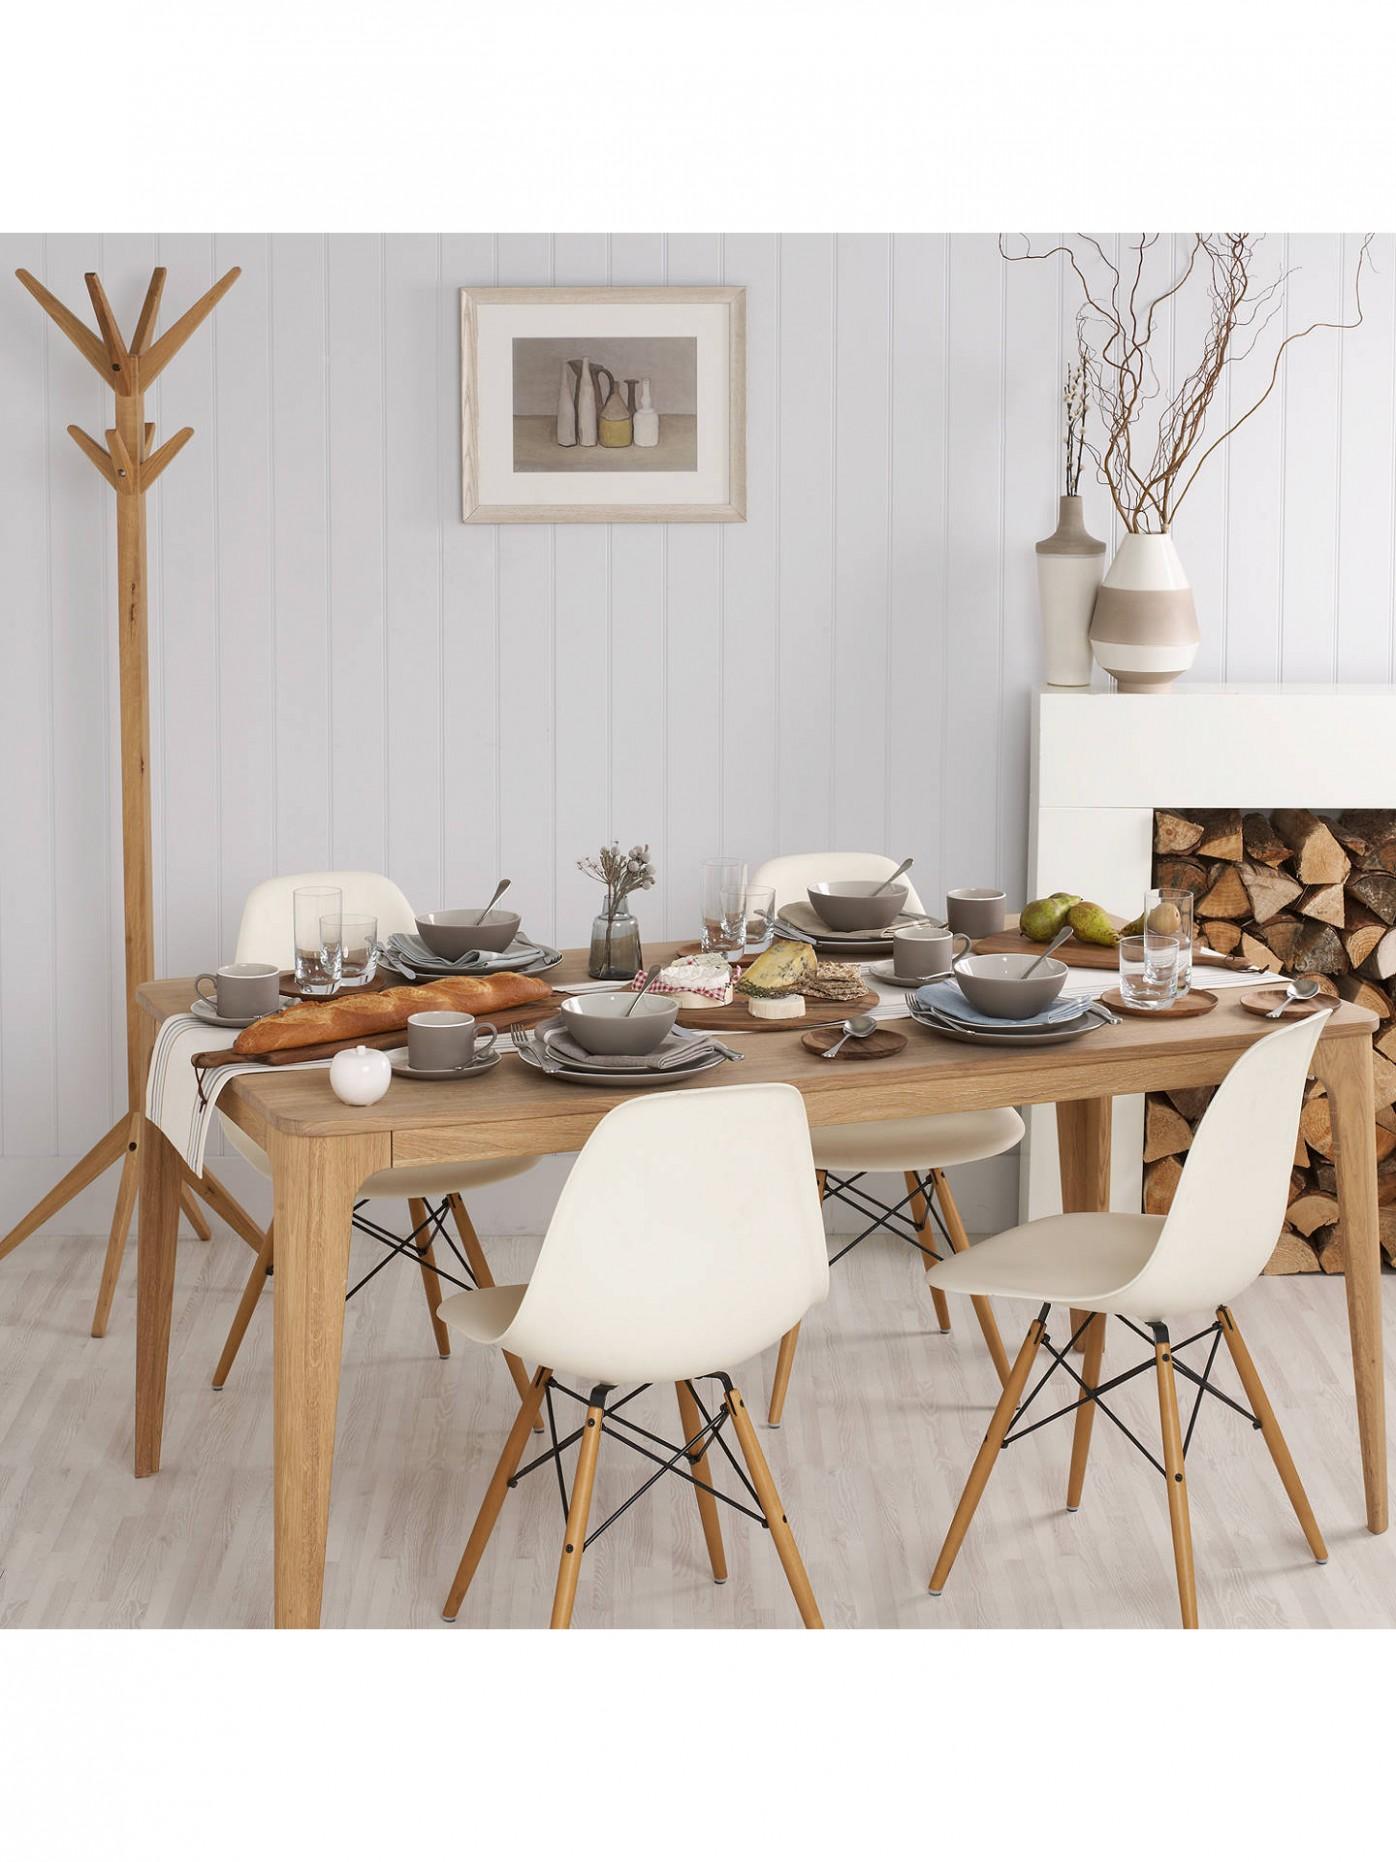 Ebbe Gehl for John Lewis Mira 9 Seater Dining Table, Oak - John Lewis Dining Room Ideas